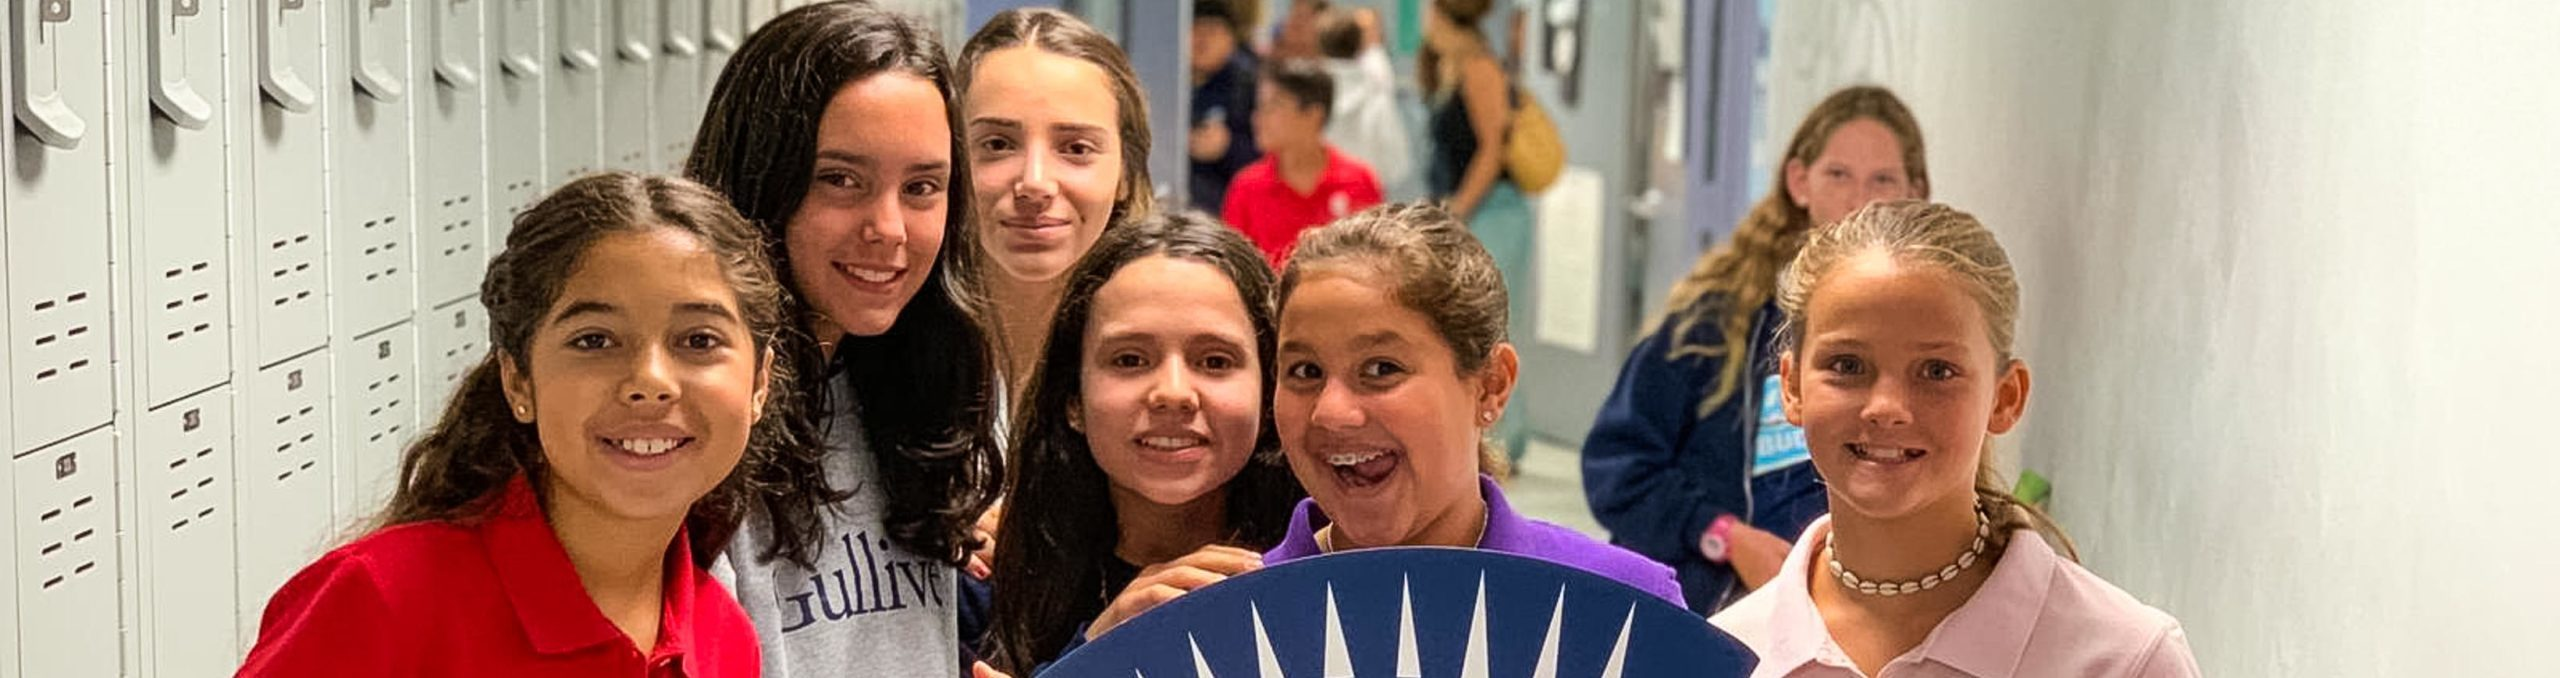 students holding a giant Gulliver foam logo